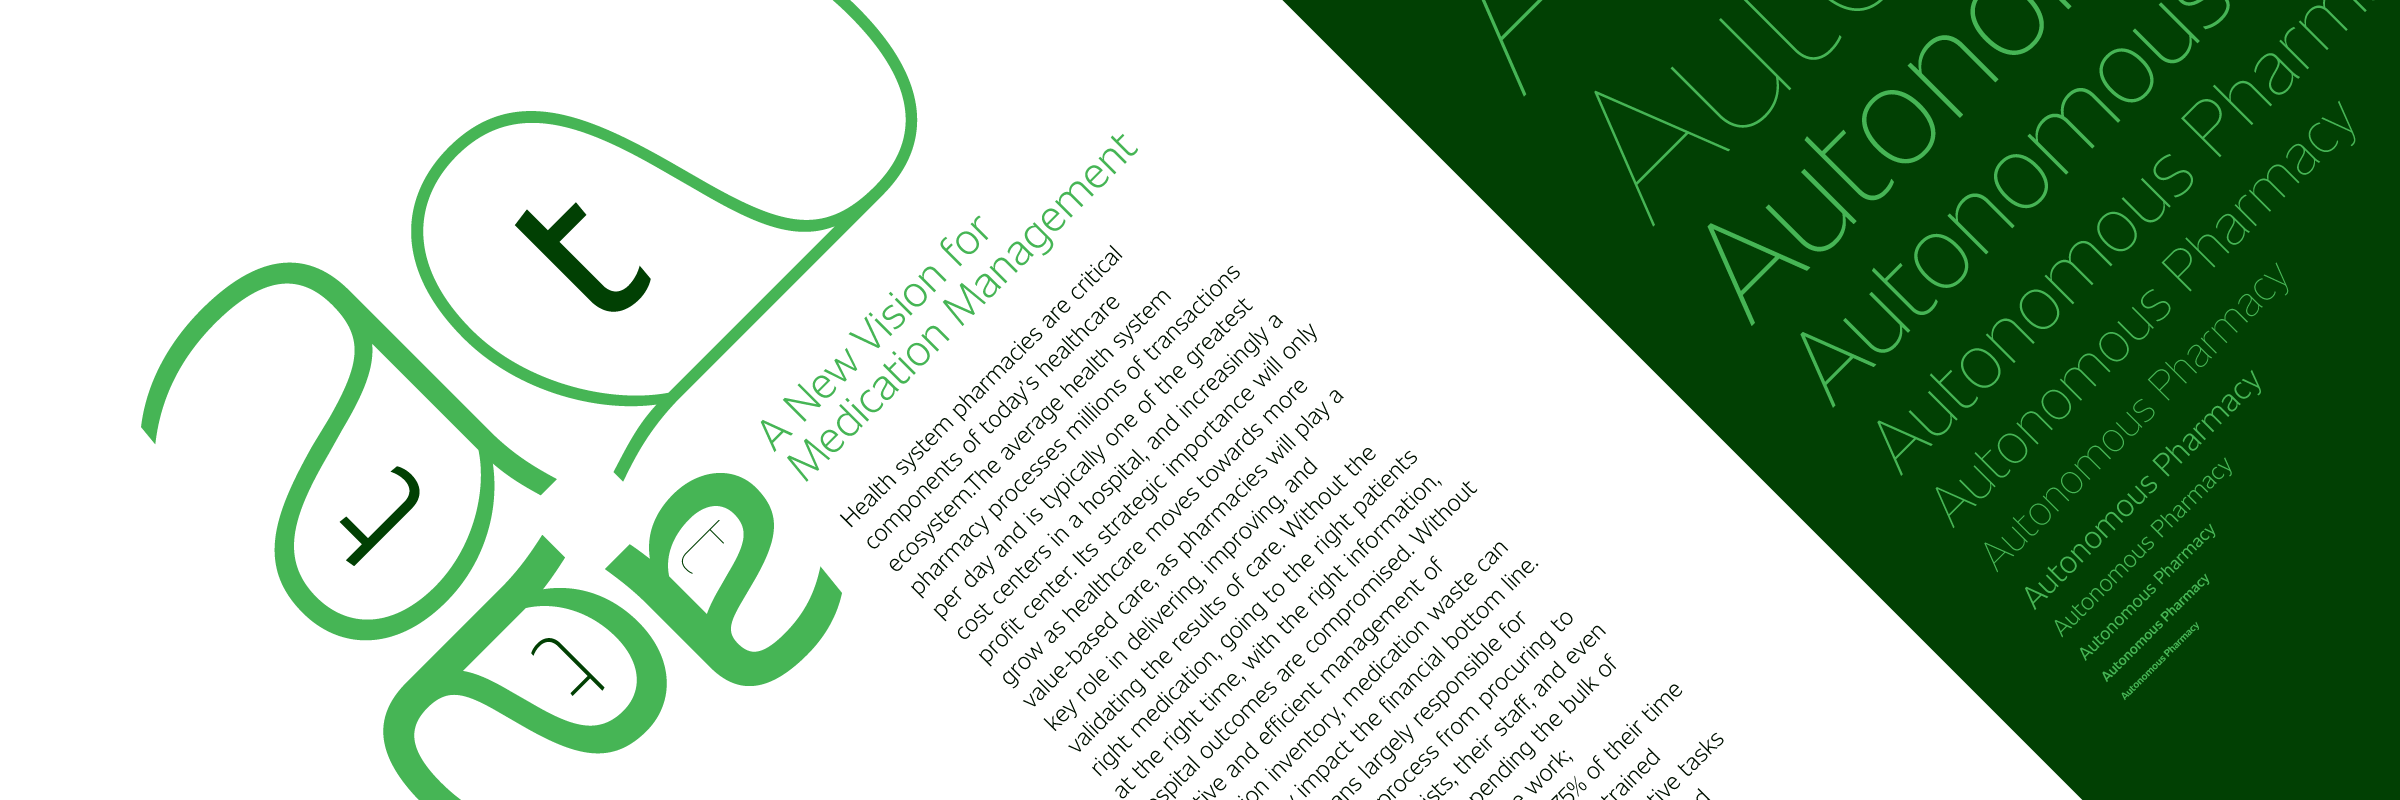 img_omn_typography_header